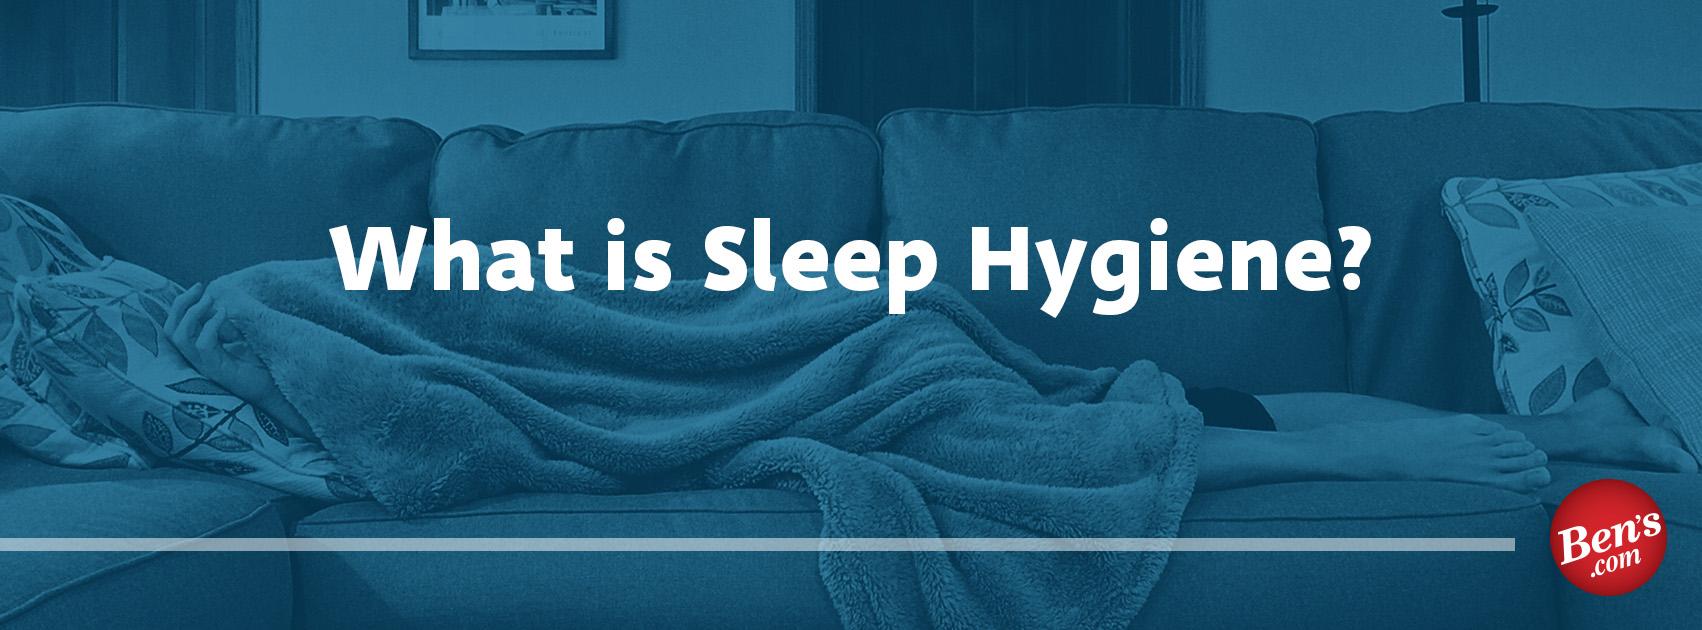 Sleep Hygiene